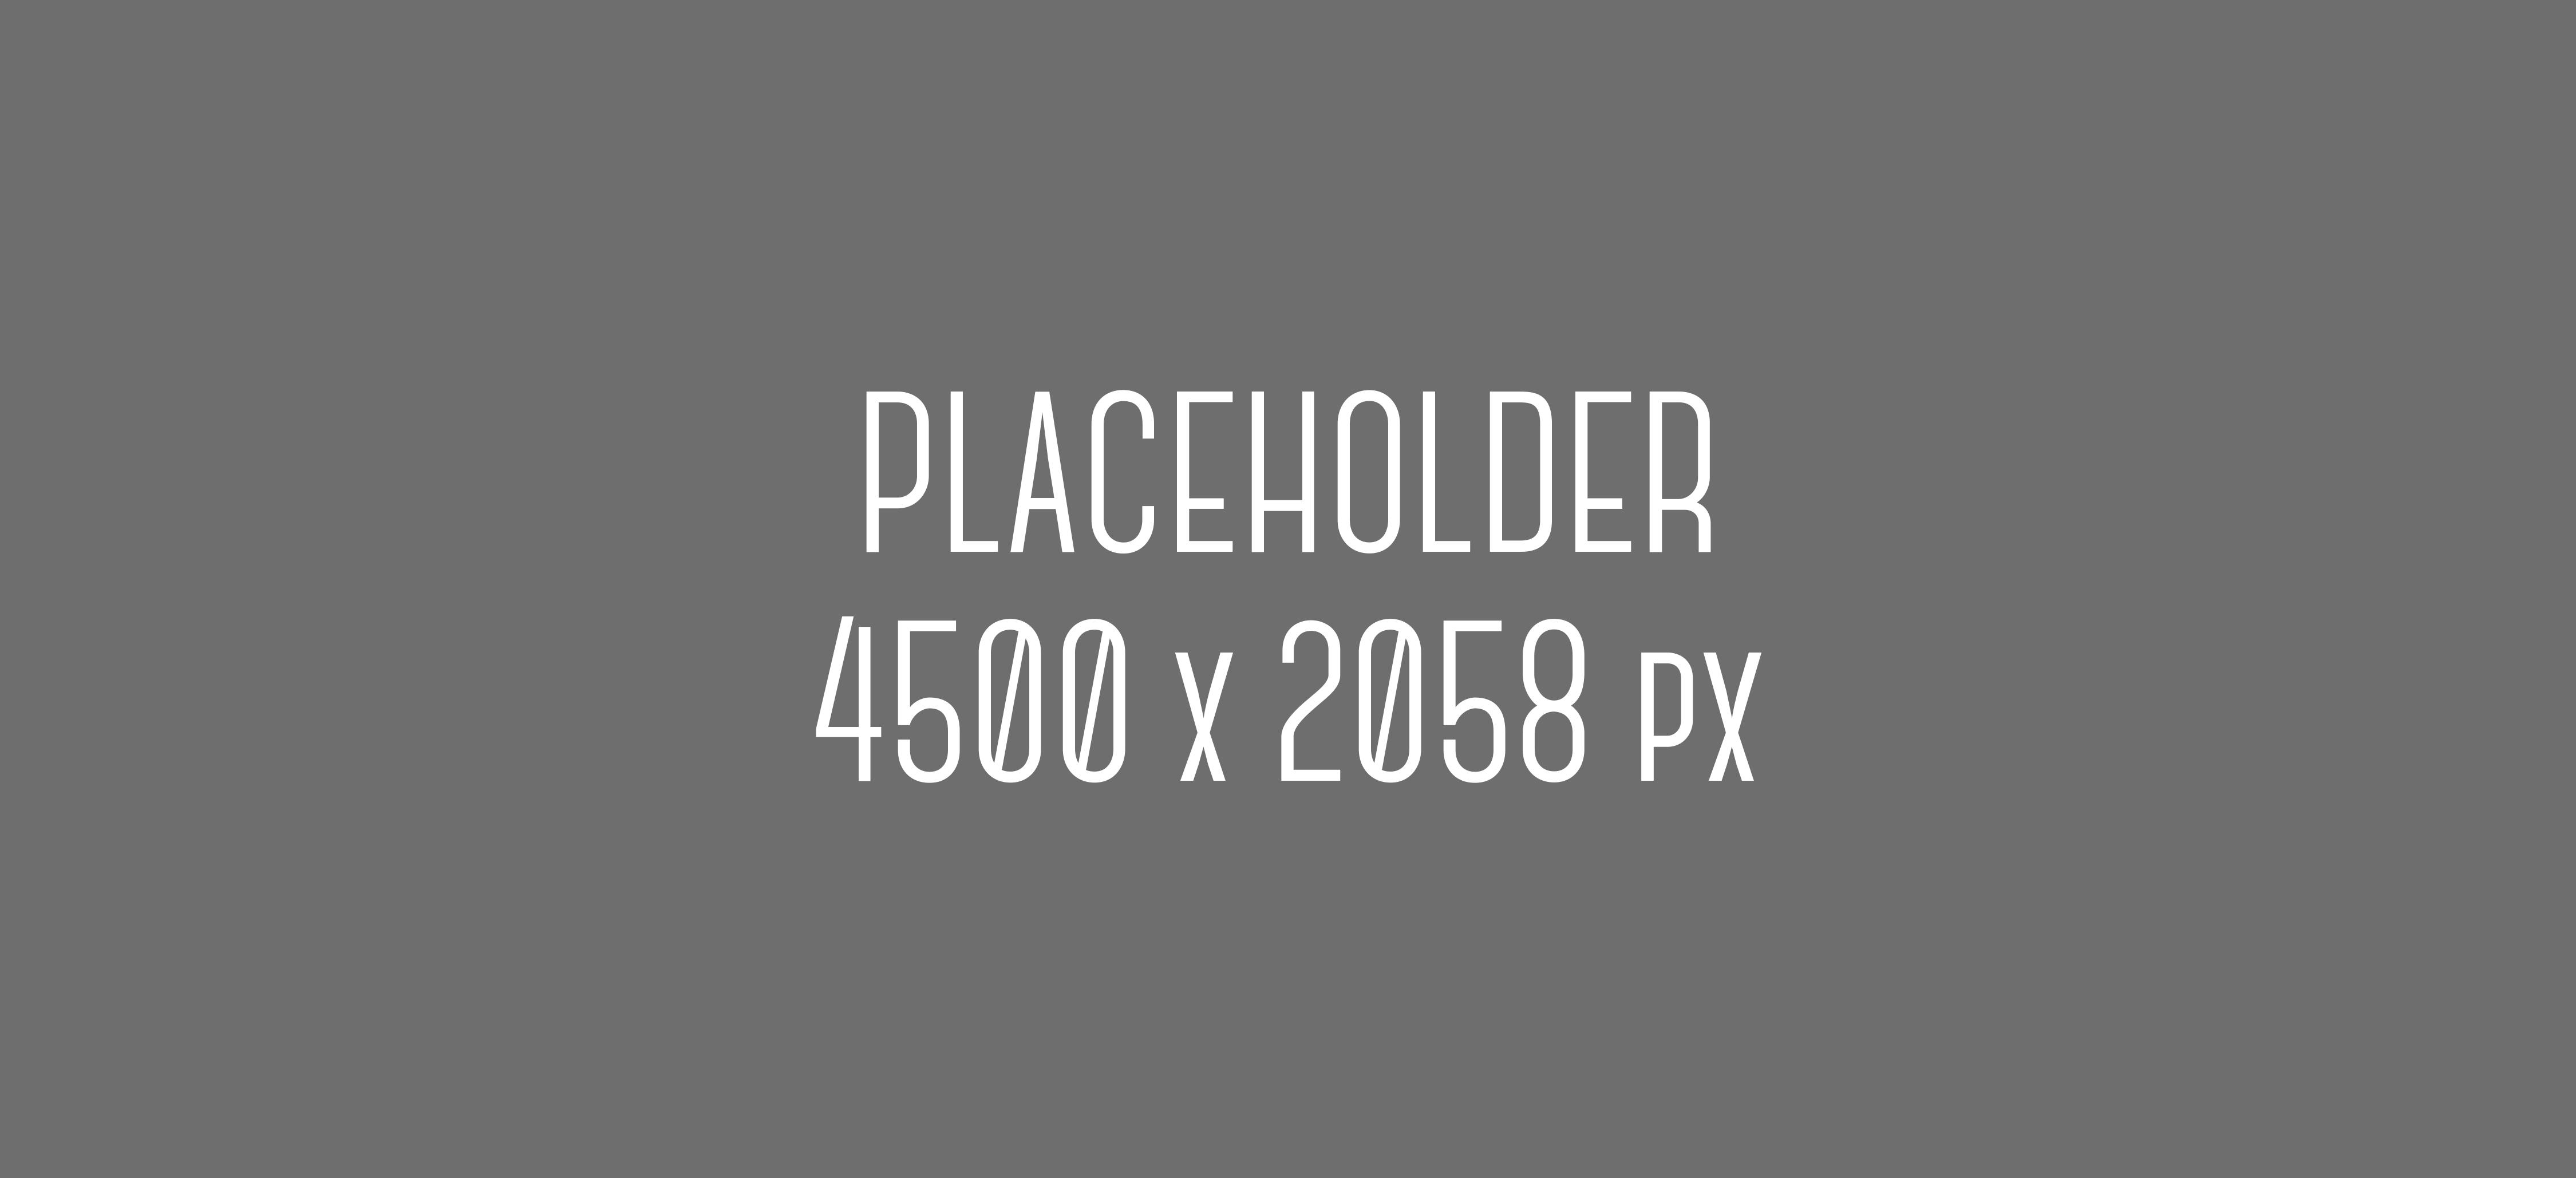 Placeholder-Header-4500x2058px